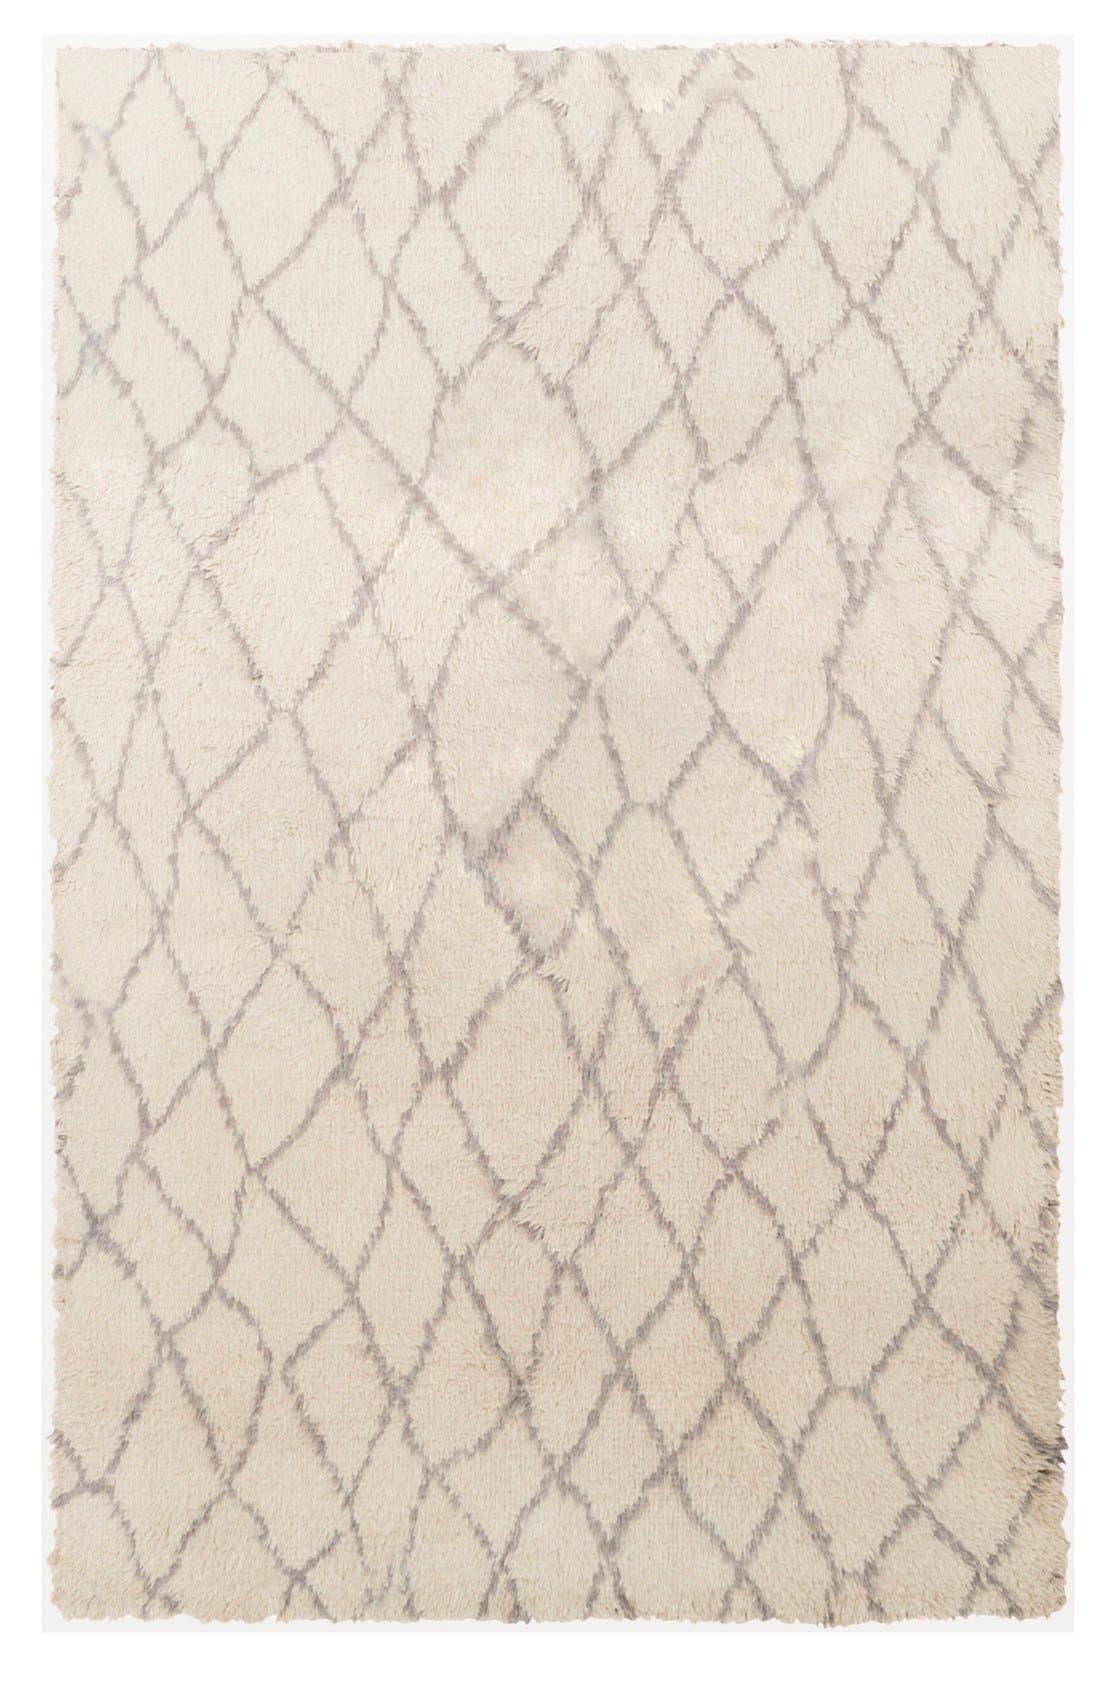 Main Image - Surya Home 'Denali - Lines' Wool Rug